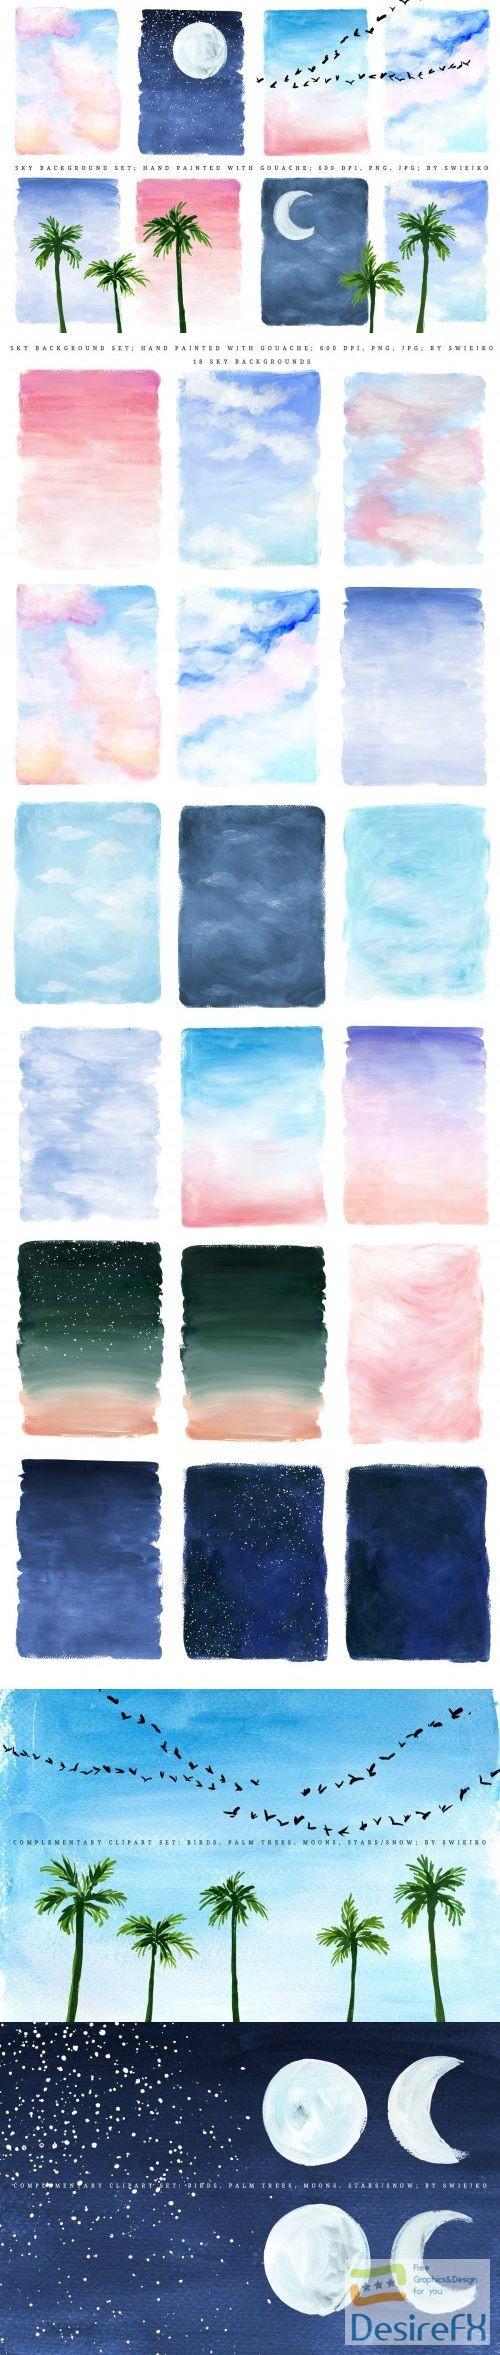 Sky background, illustration set - 2303621